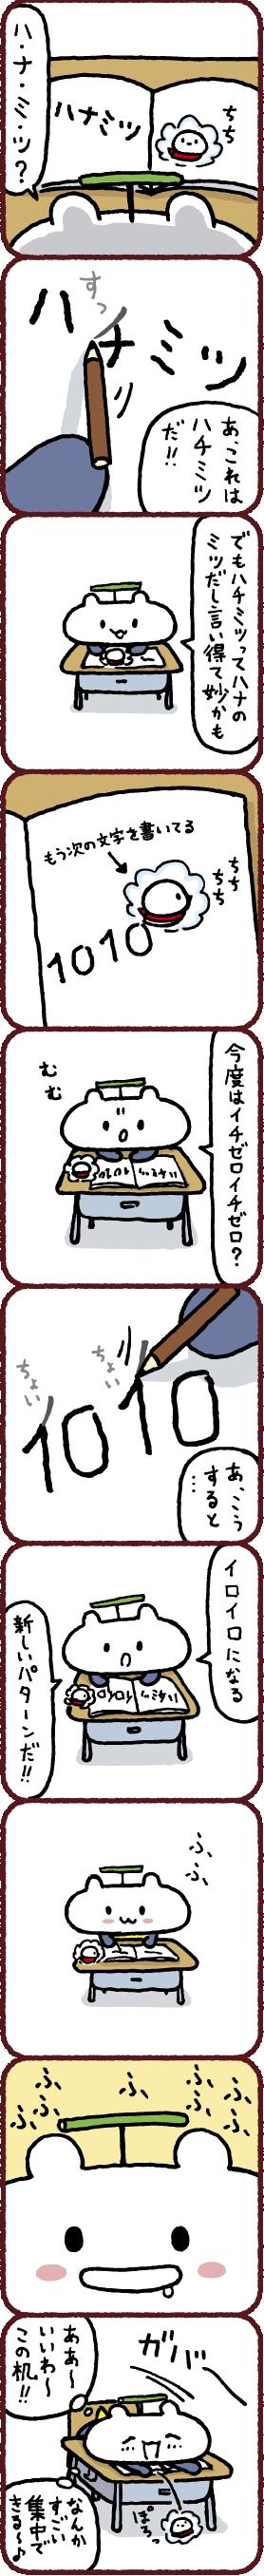 028+2+